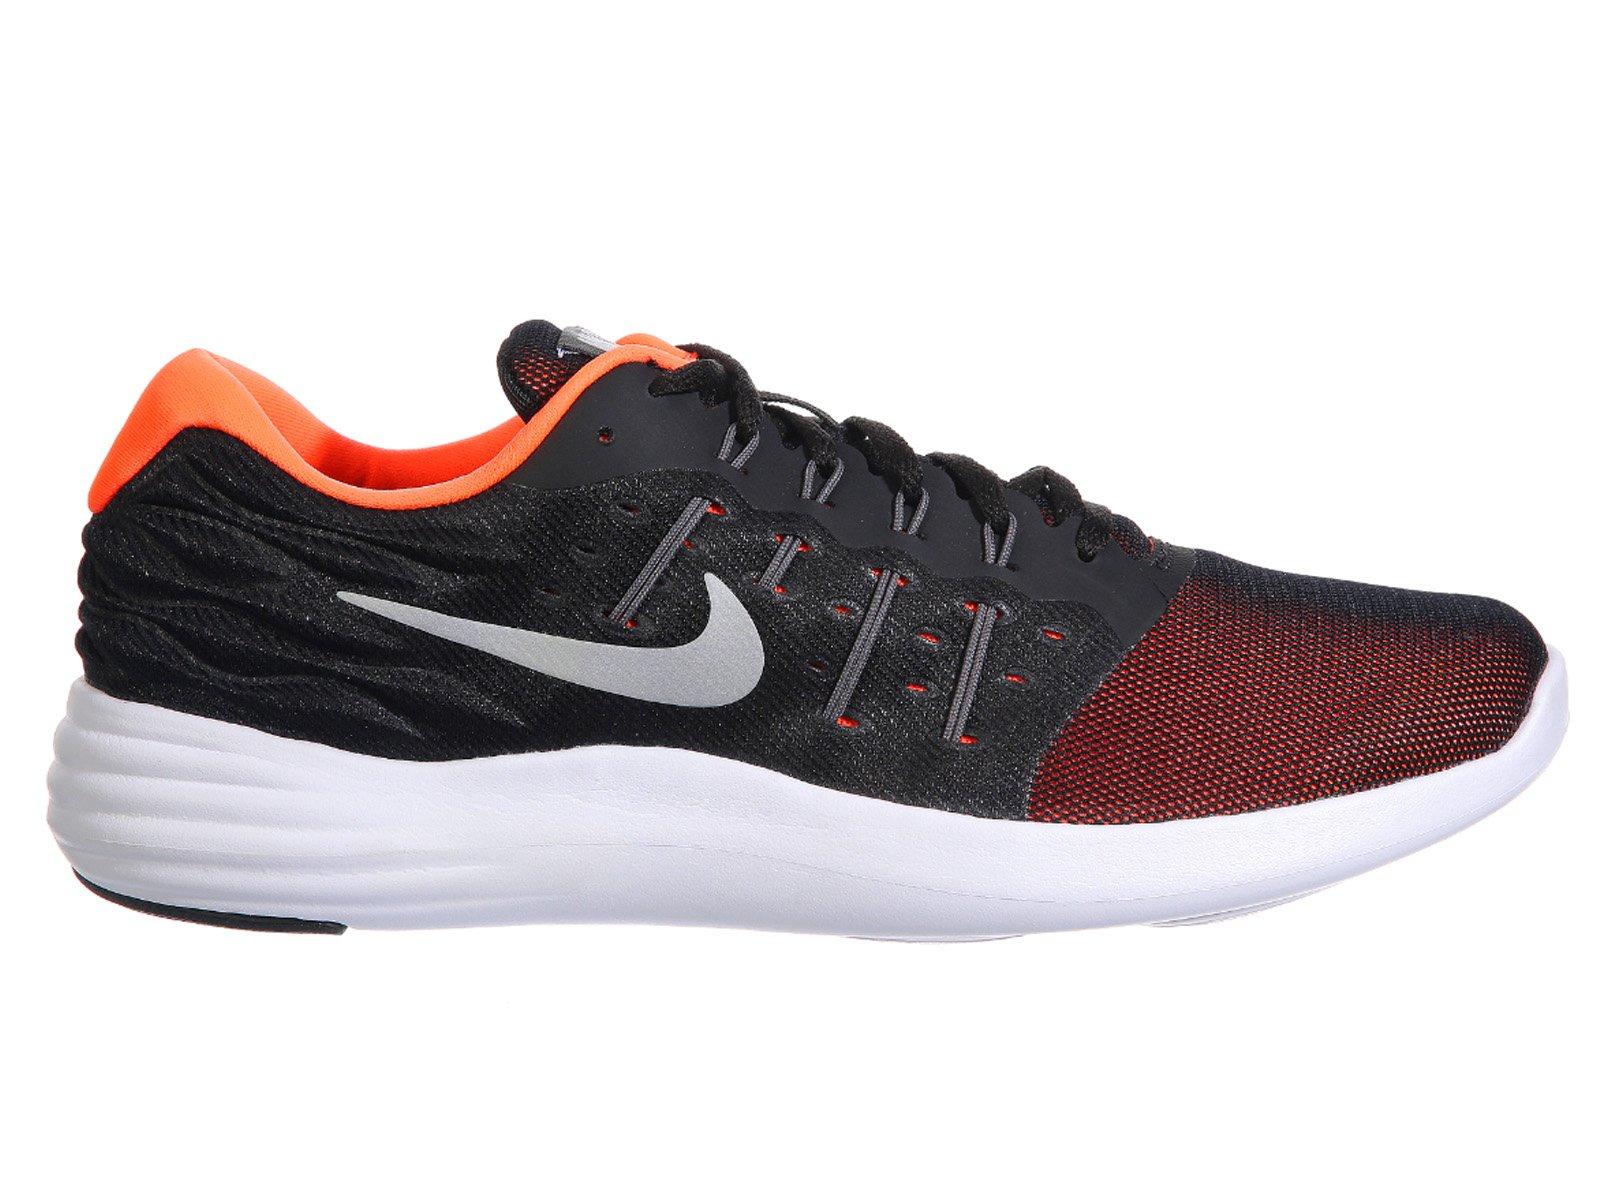 newest c9415 ddc03 Galleon - NIKE Men s Lunarstelos Black Dark Grey Hyper Orange Metallic  Silver Nylon Running Shoes 8.5 D(M) US